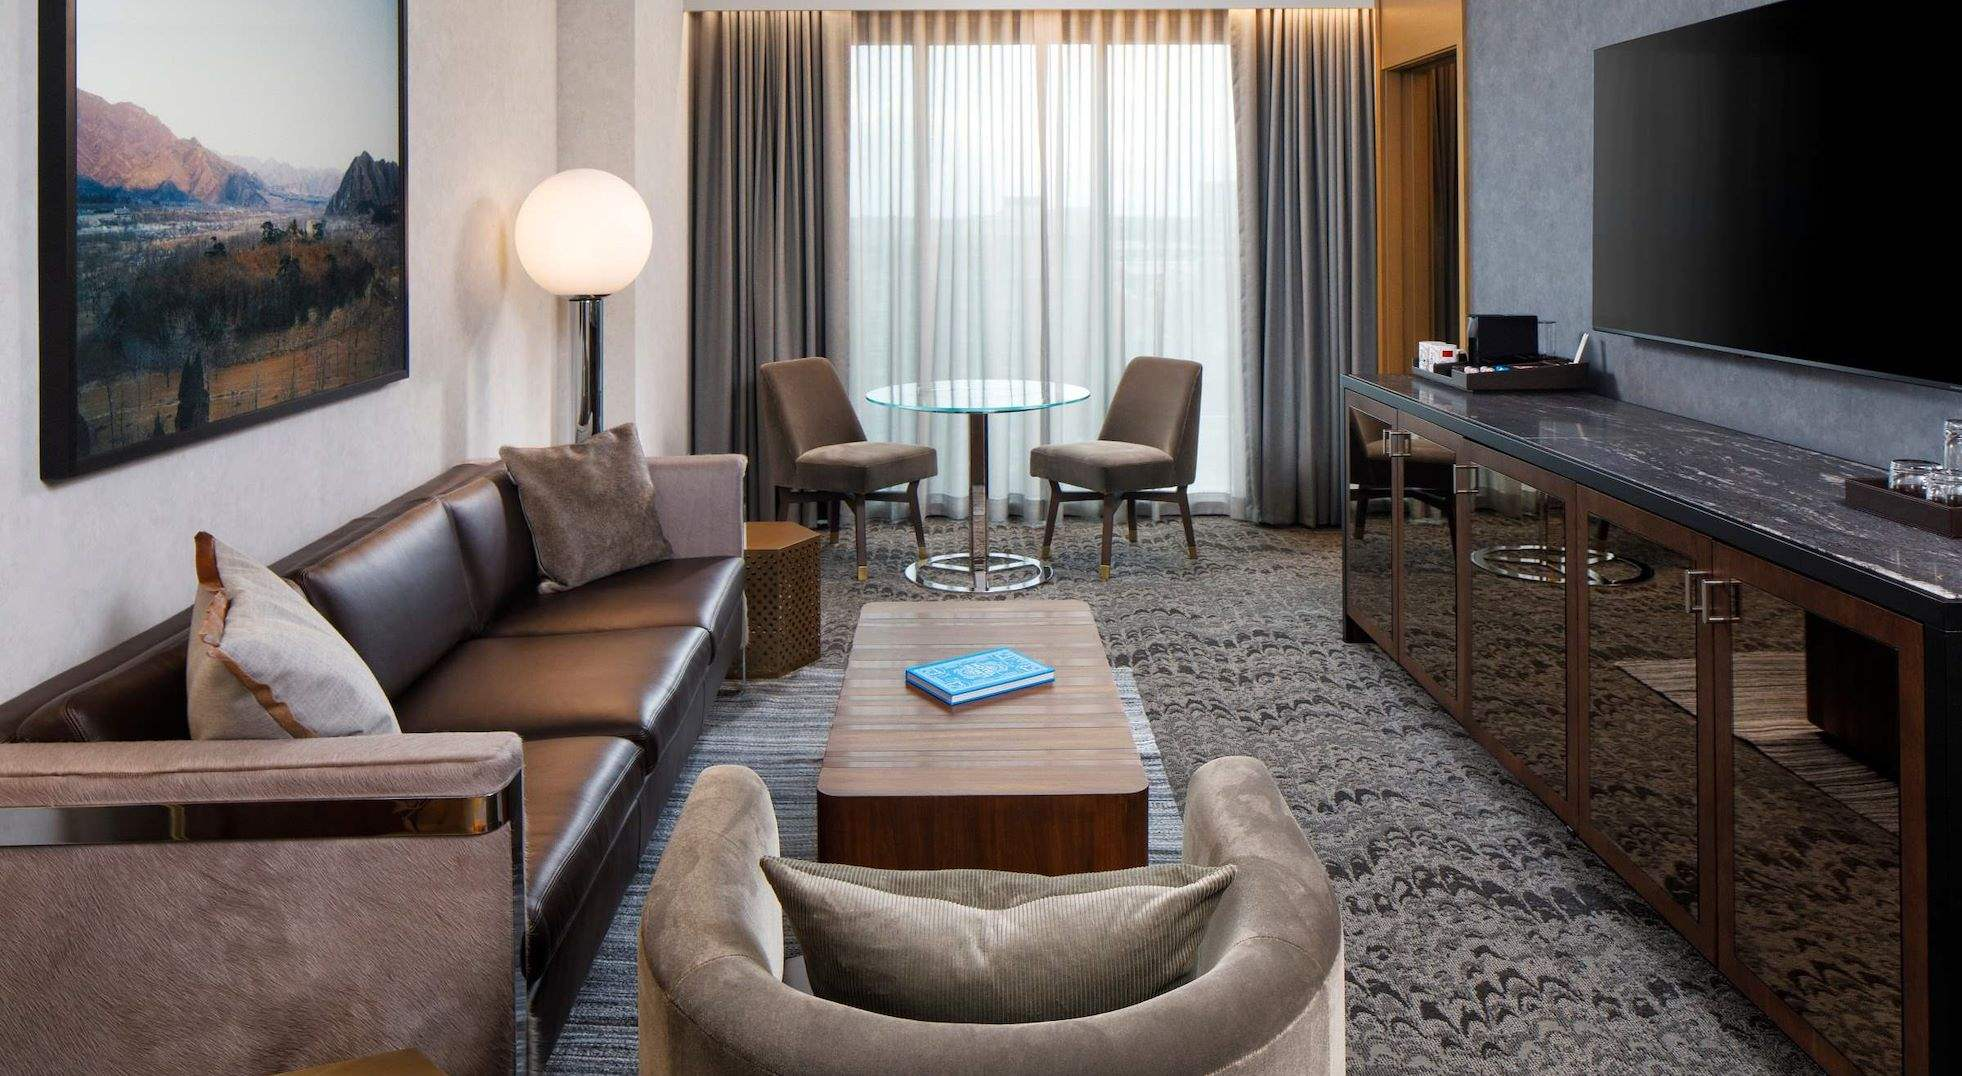 Luxury Suite of The Joseph Hotel, Nashville